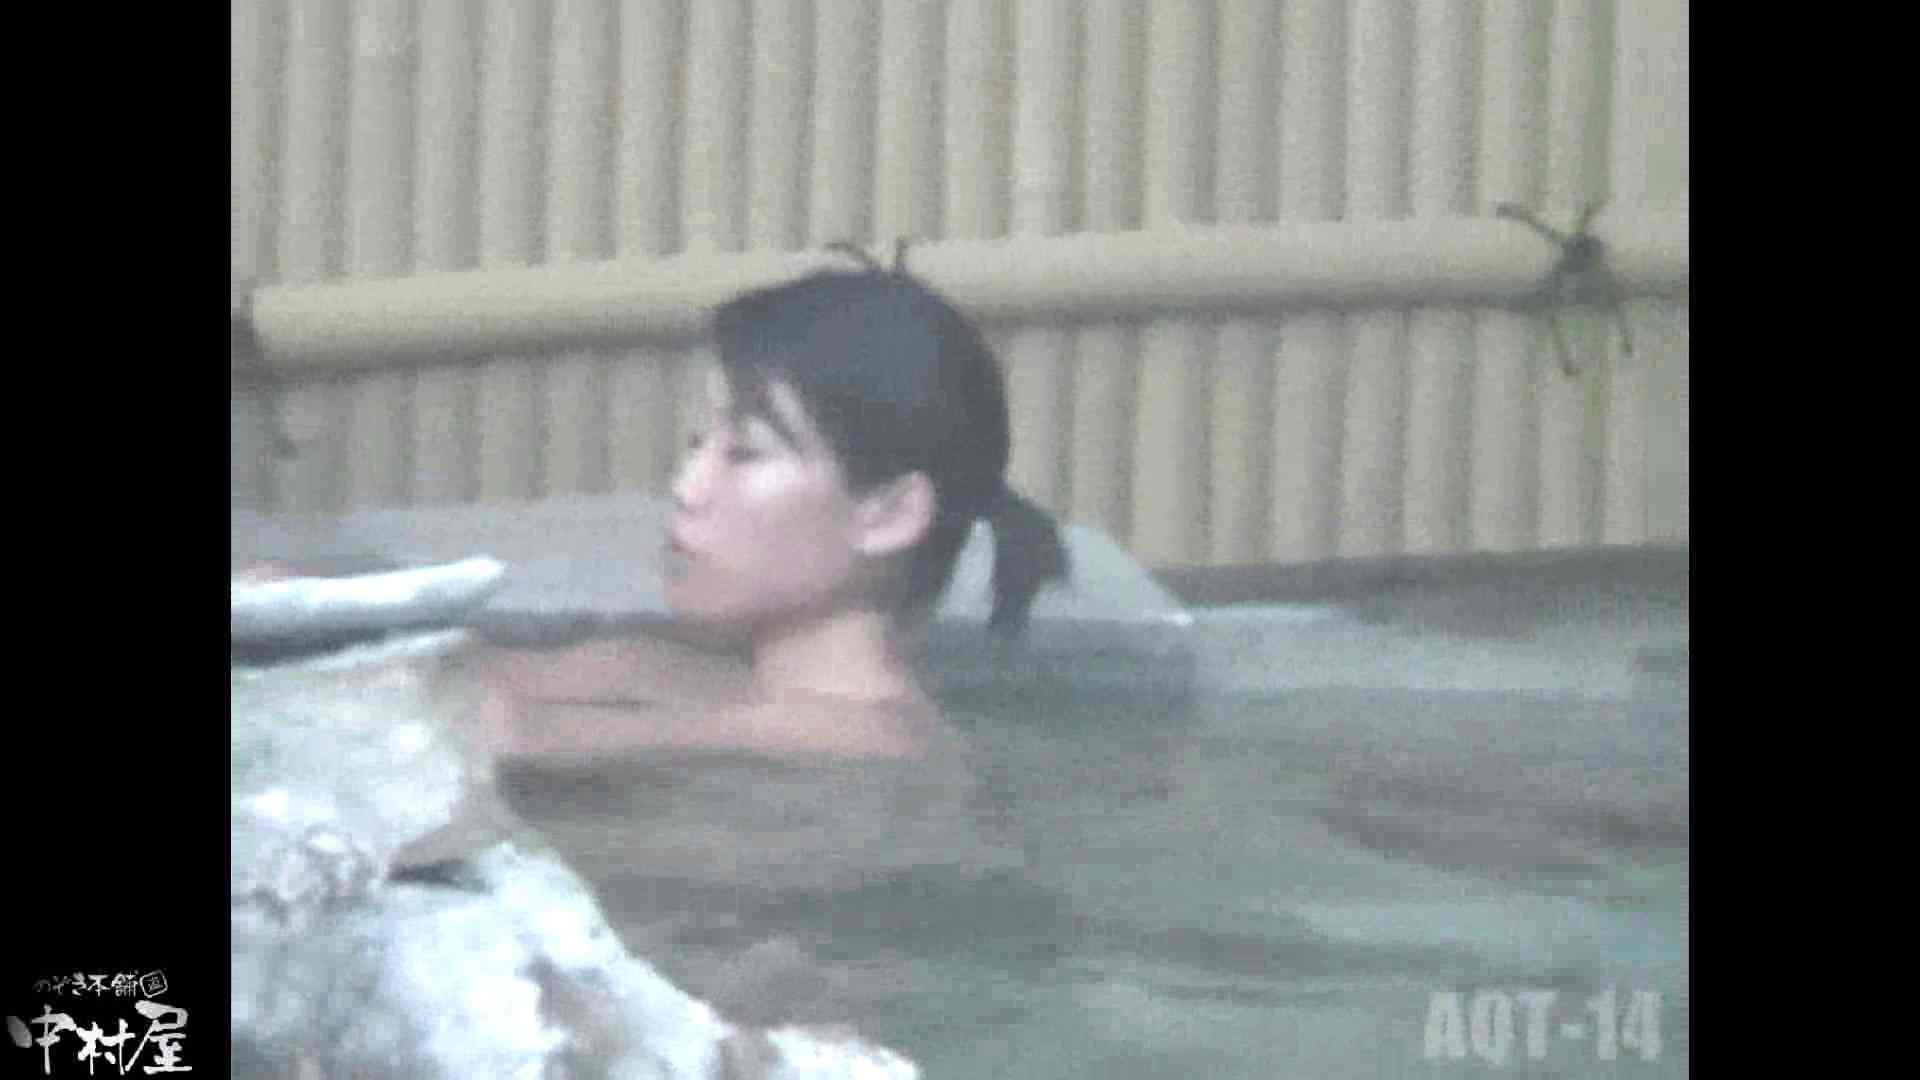 Aquaな露天風呂Vol.878潜入盗撮露天風呂十四判湯 其の一 潜入画像   露天  59画像 15